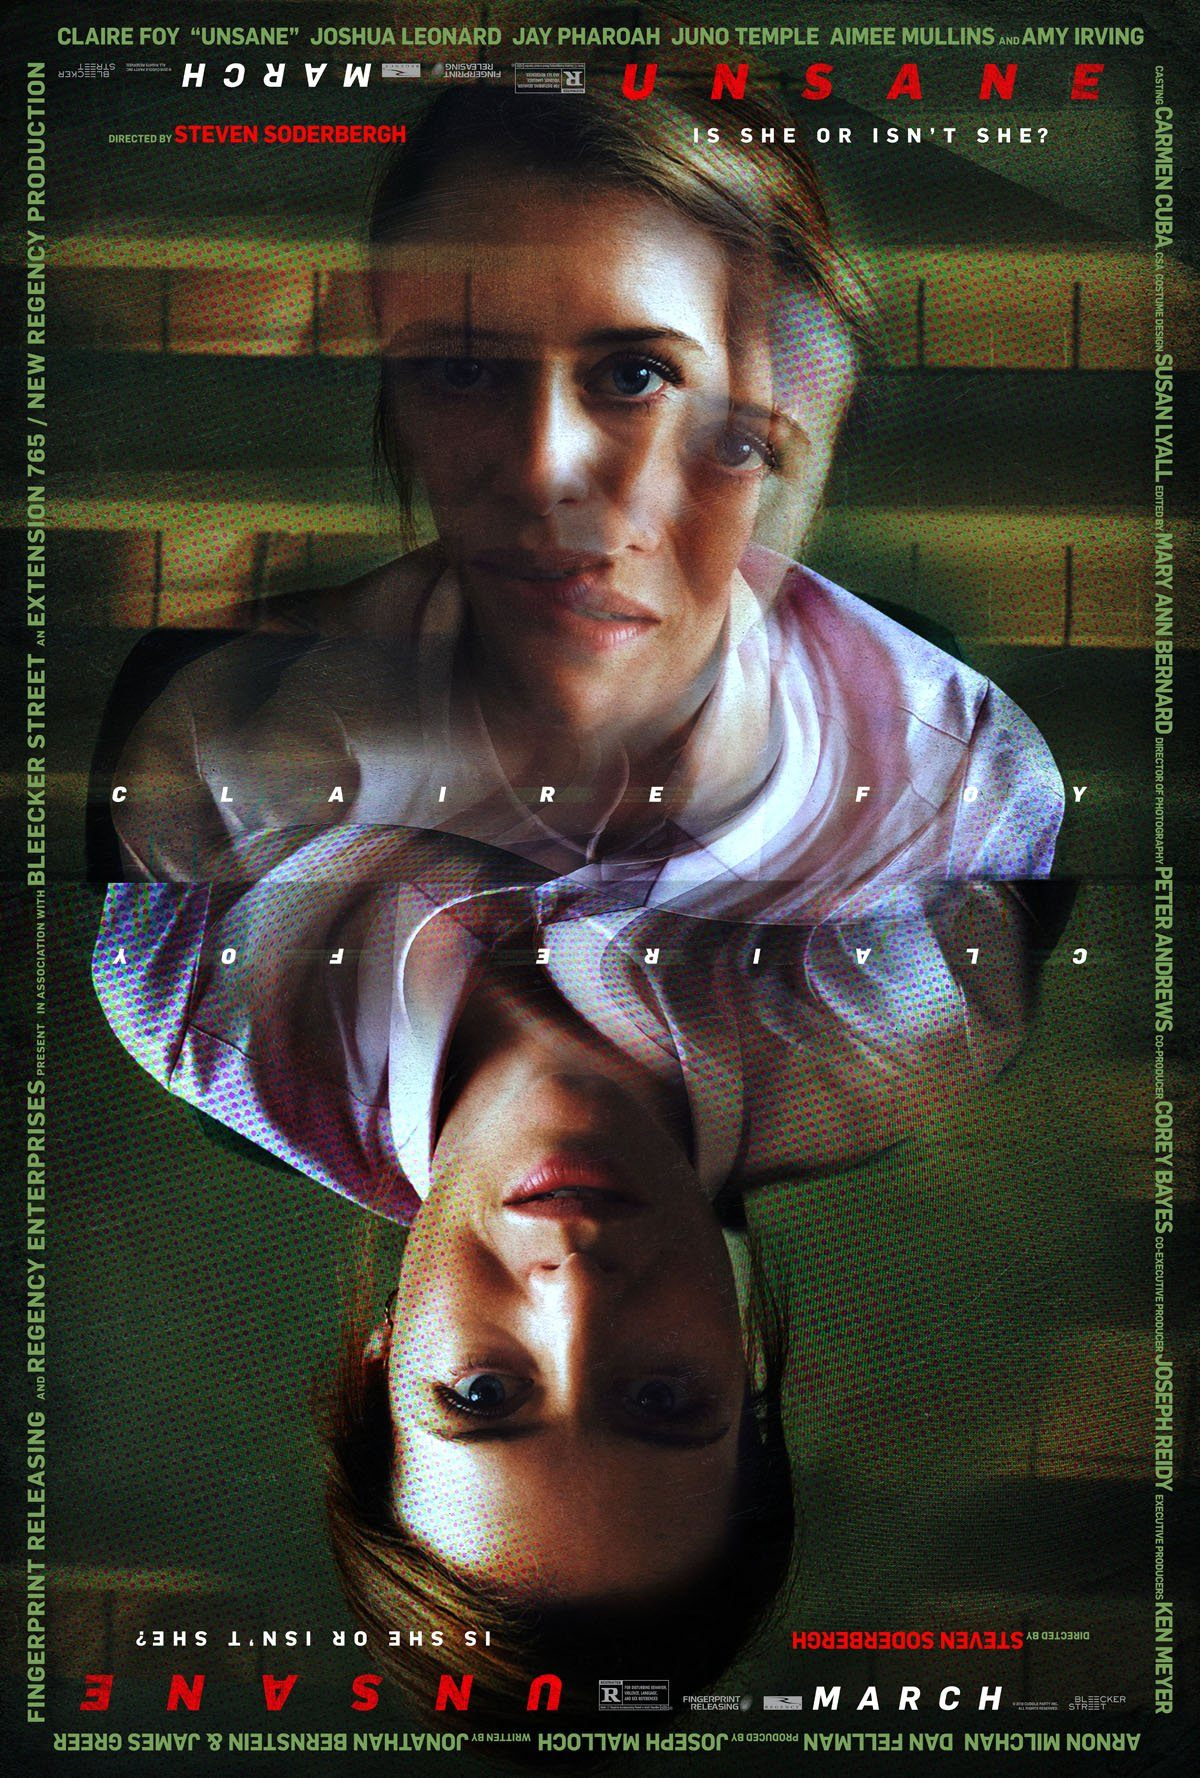 Affiche du film UNSANE de Steven Soderbergh